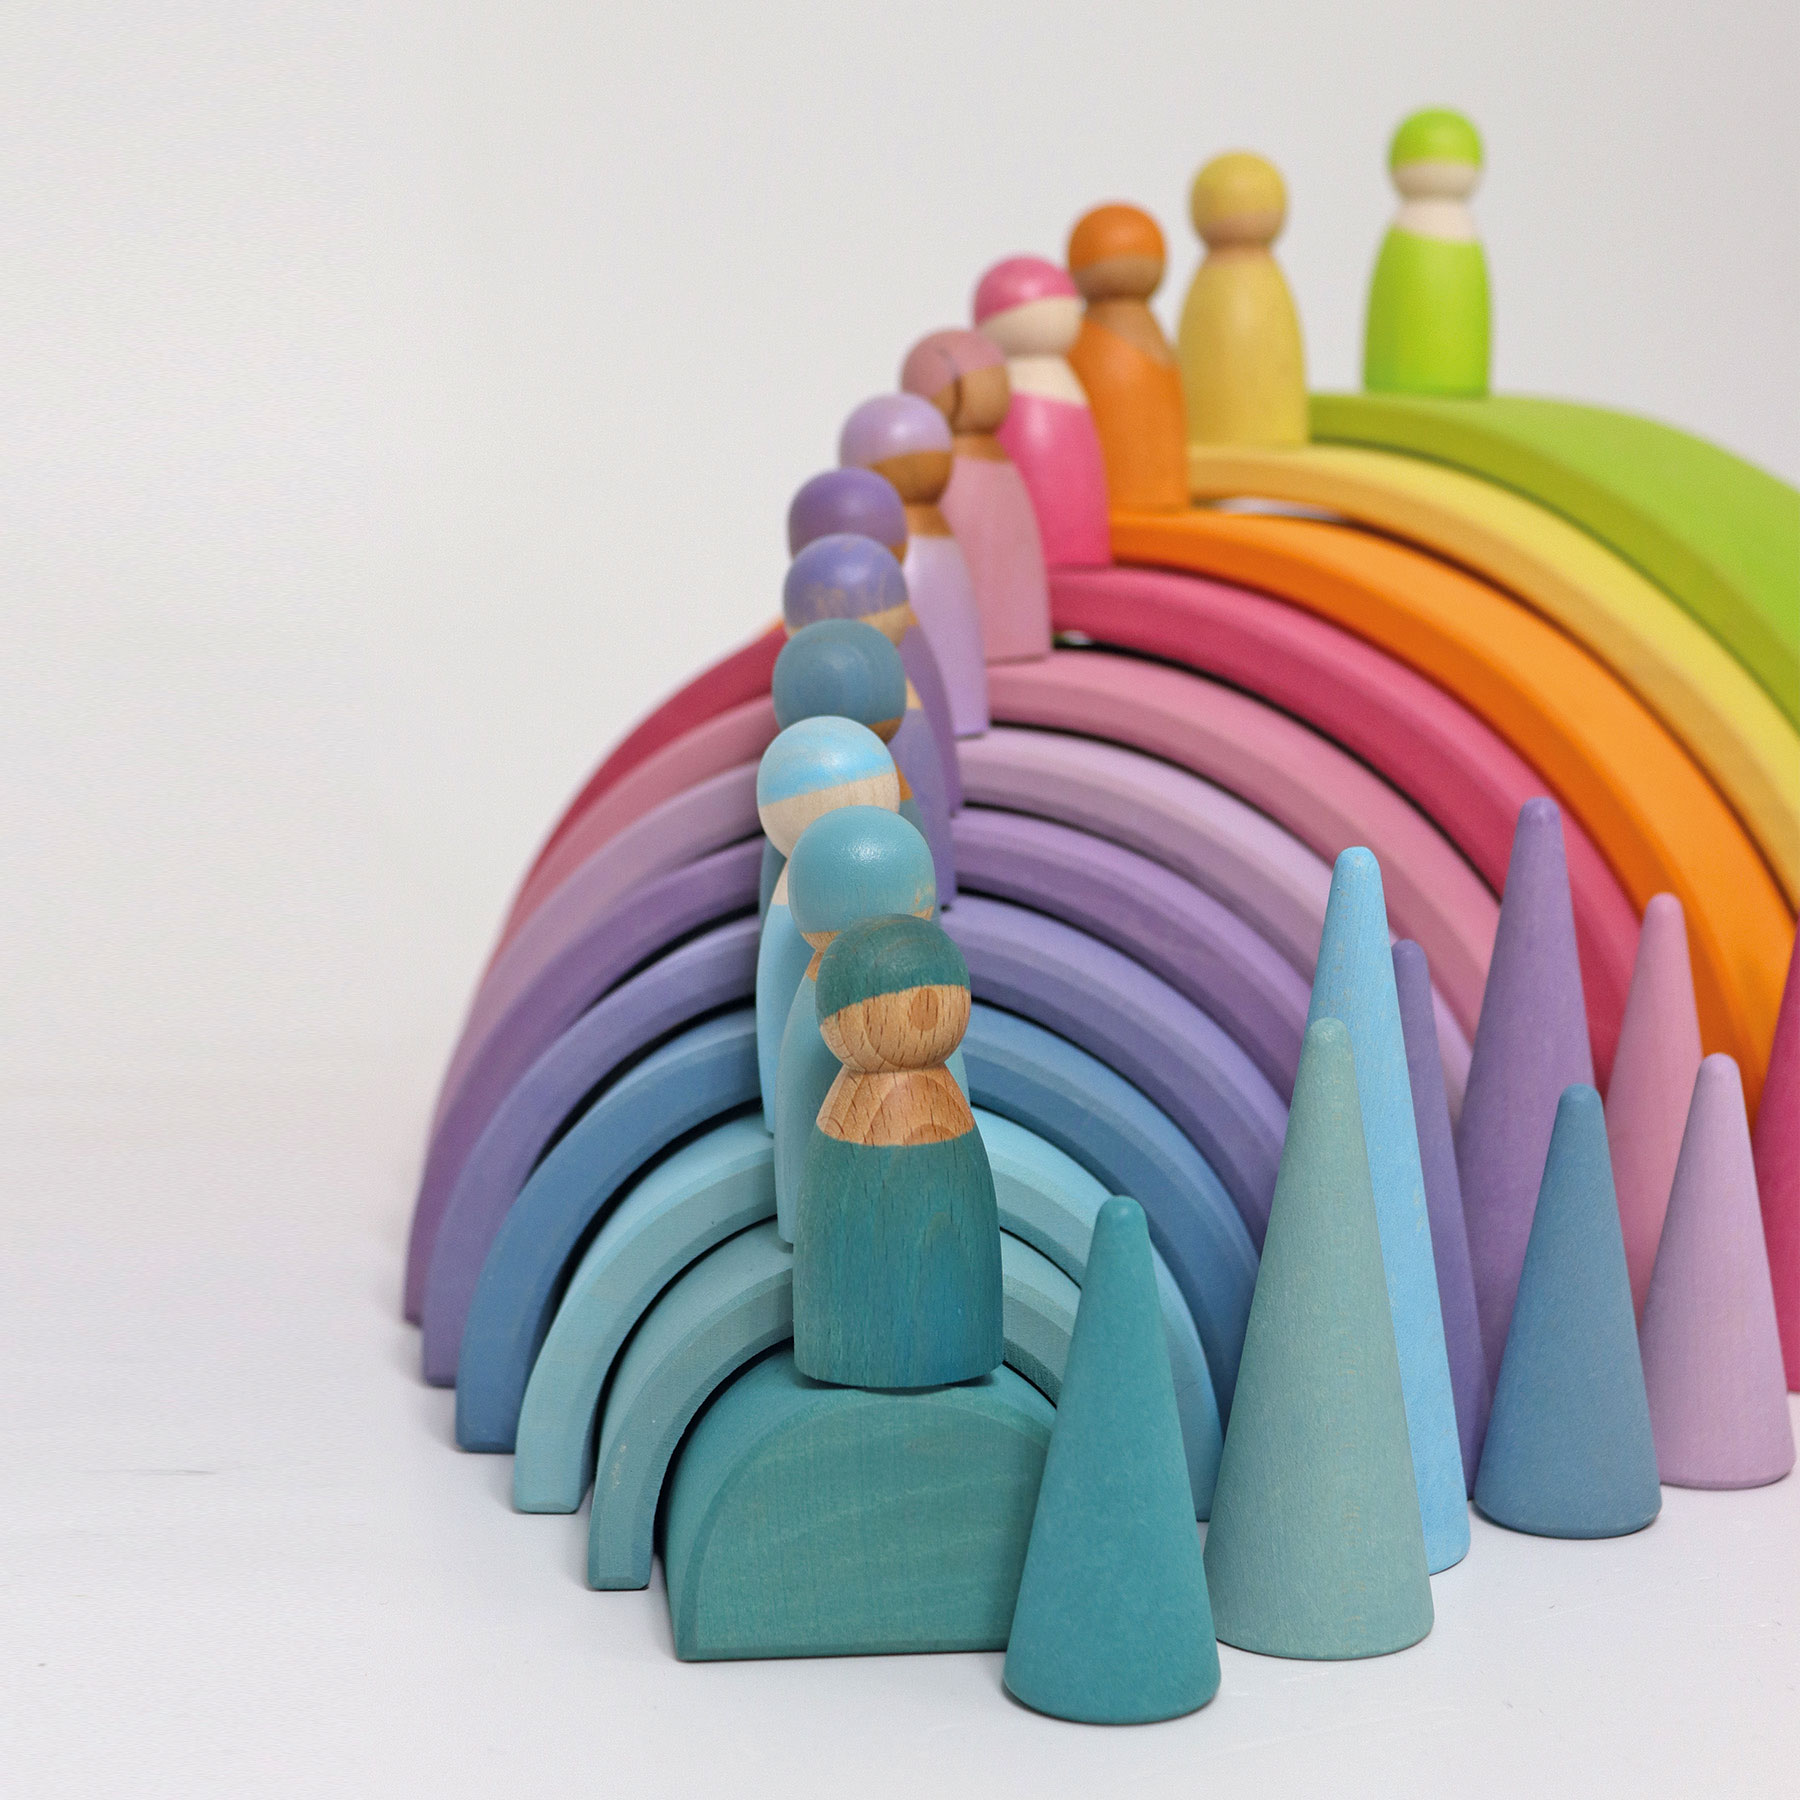 Grimms Regenbogenfreunde pastell 12 Stück